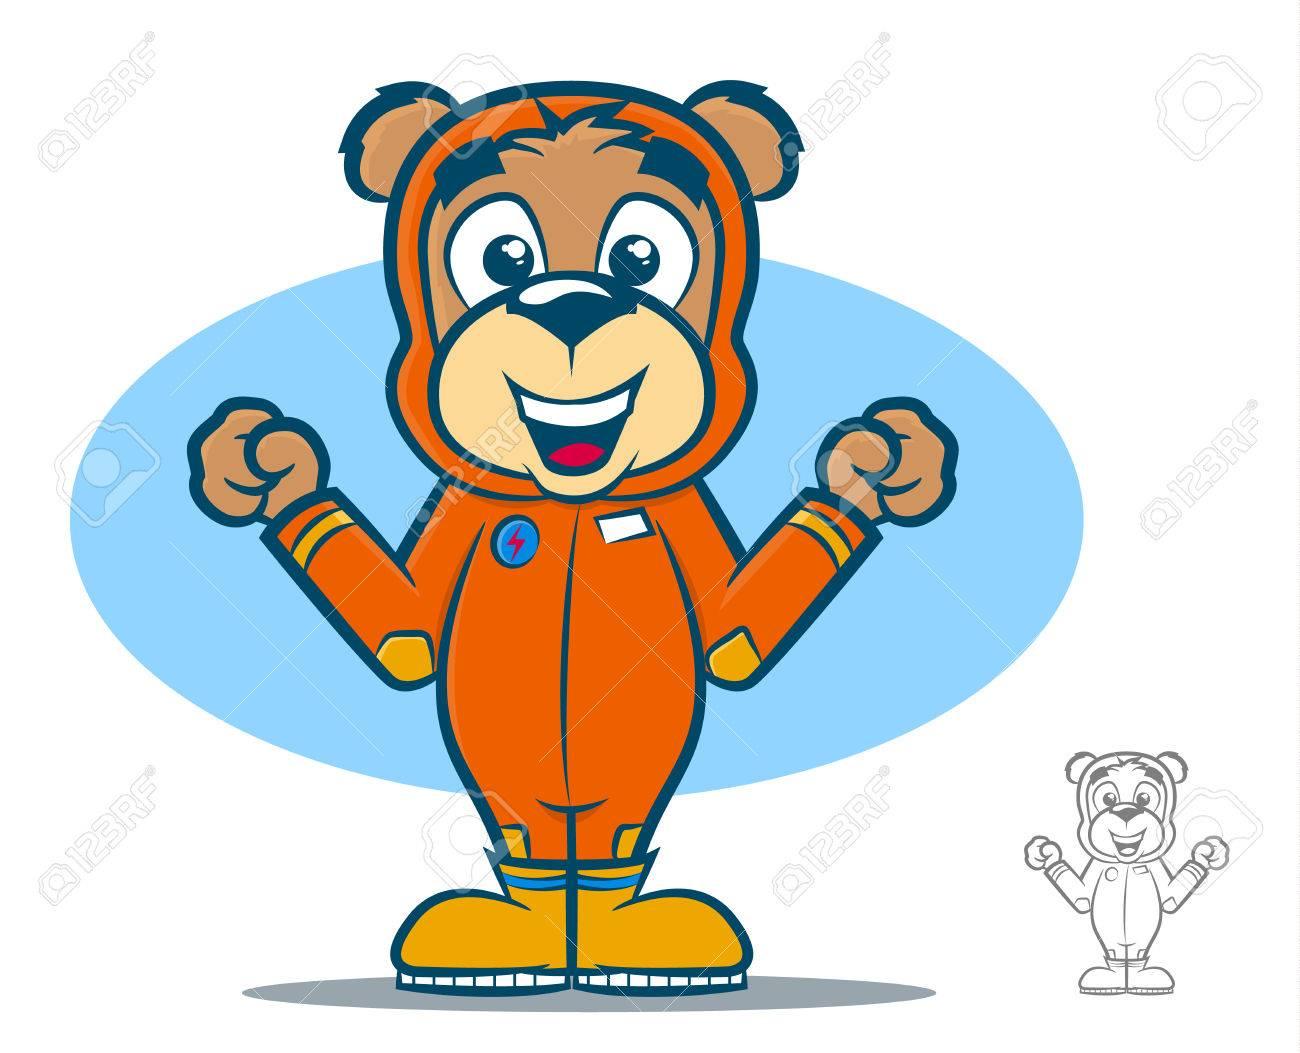 Cute teddy bear cartoon wearing an orange jumpsuit Stock Vector - 24540796